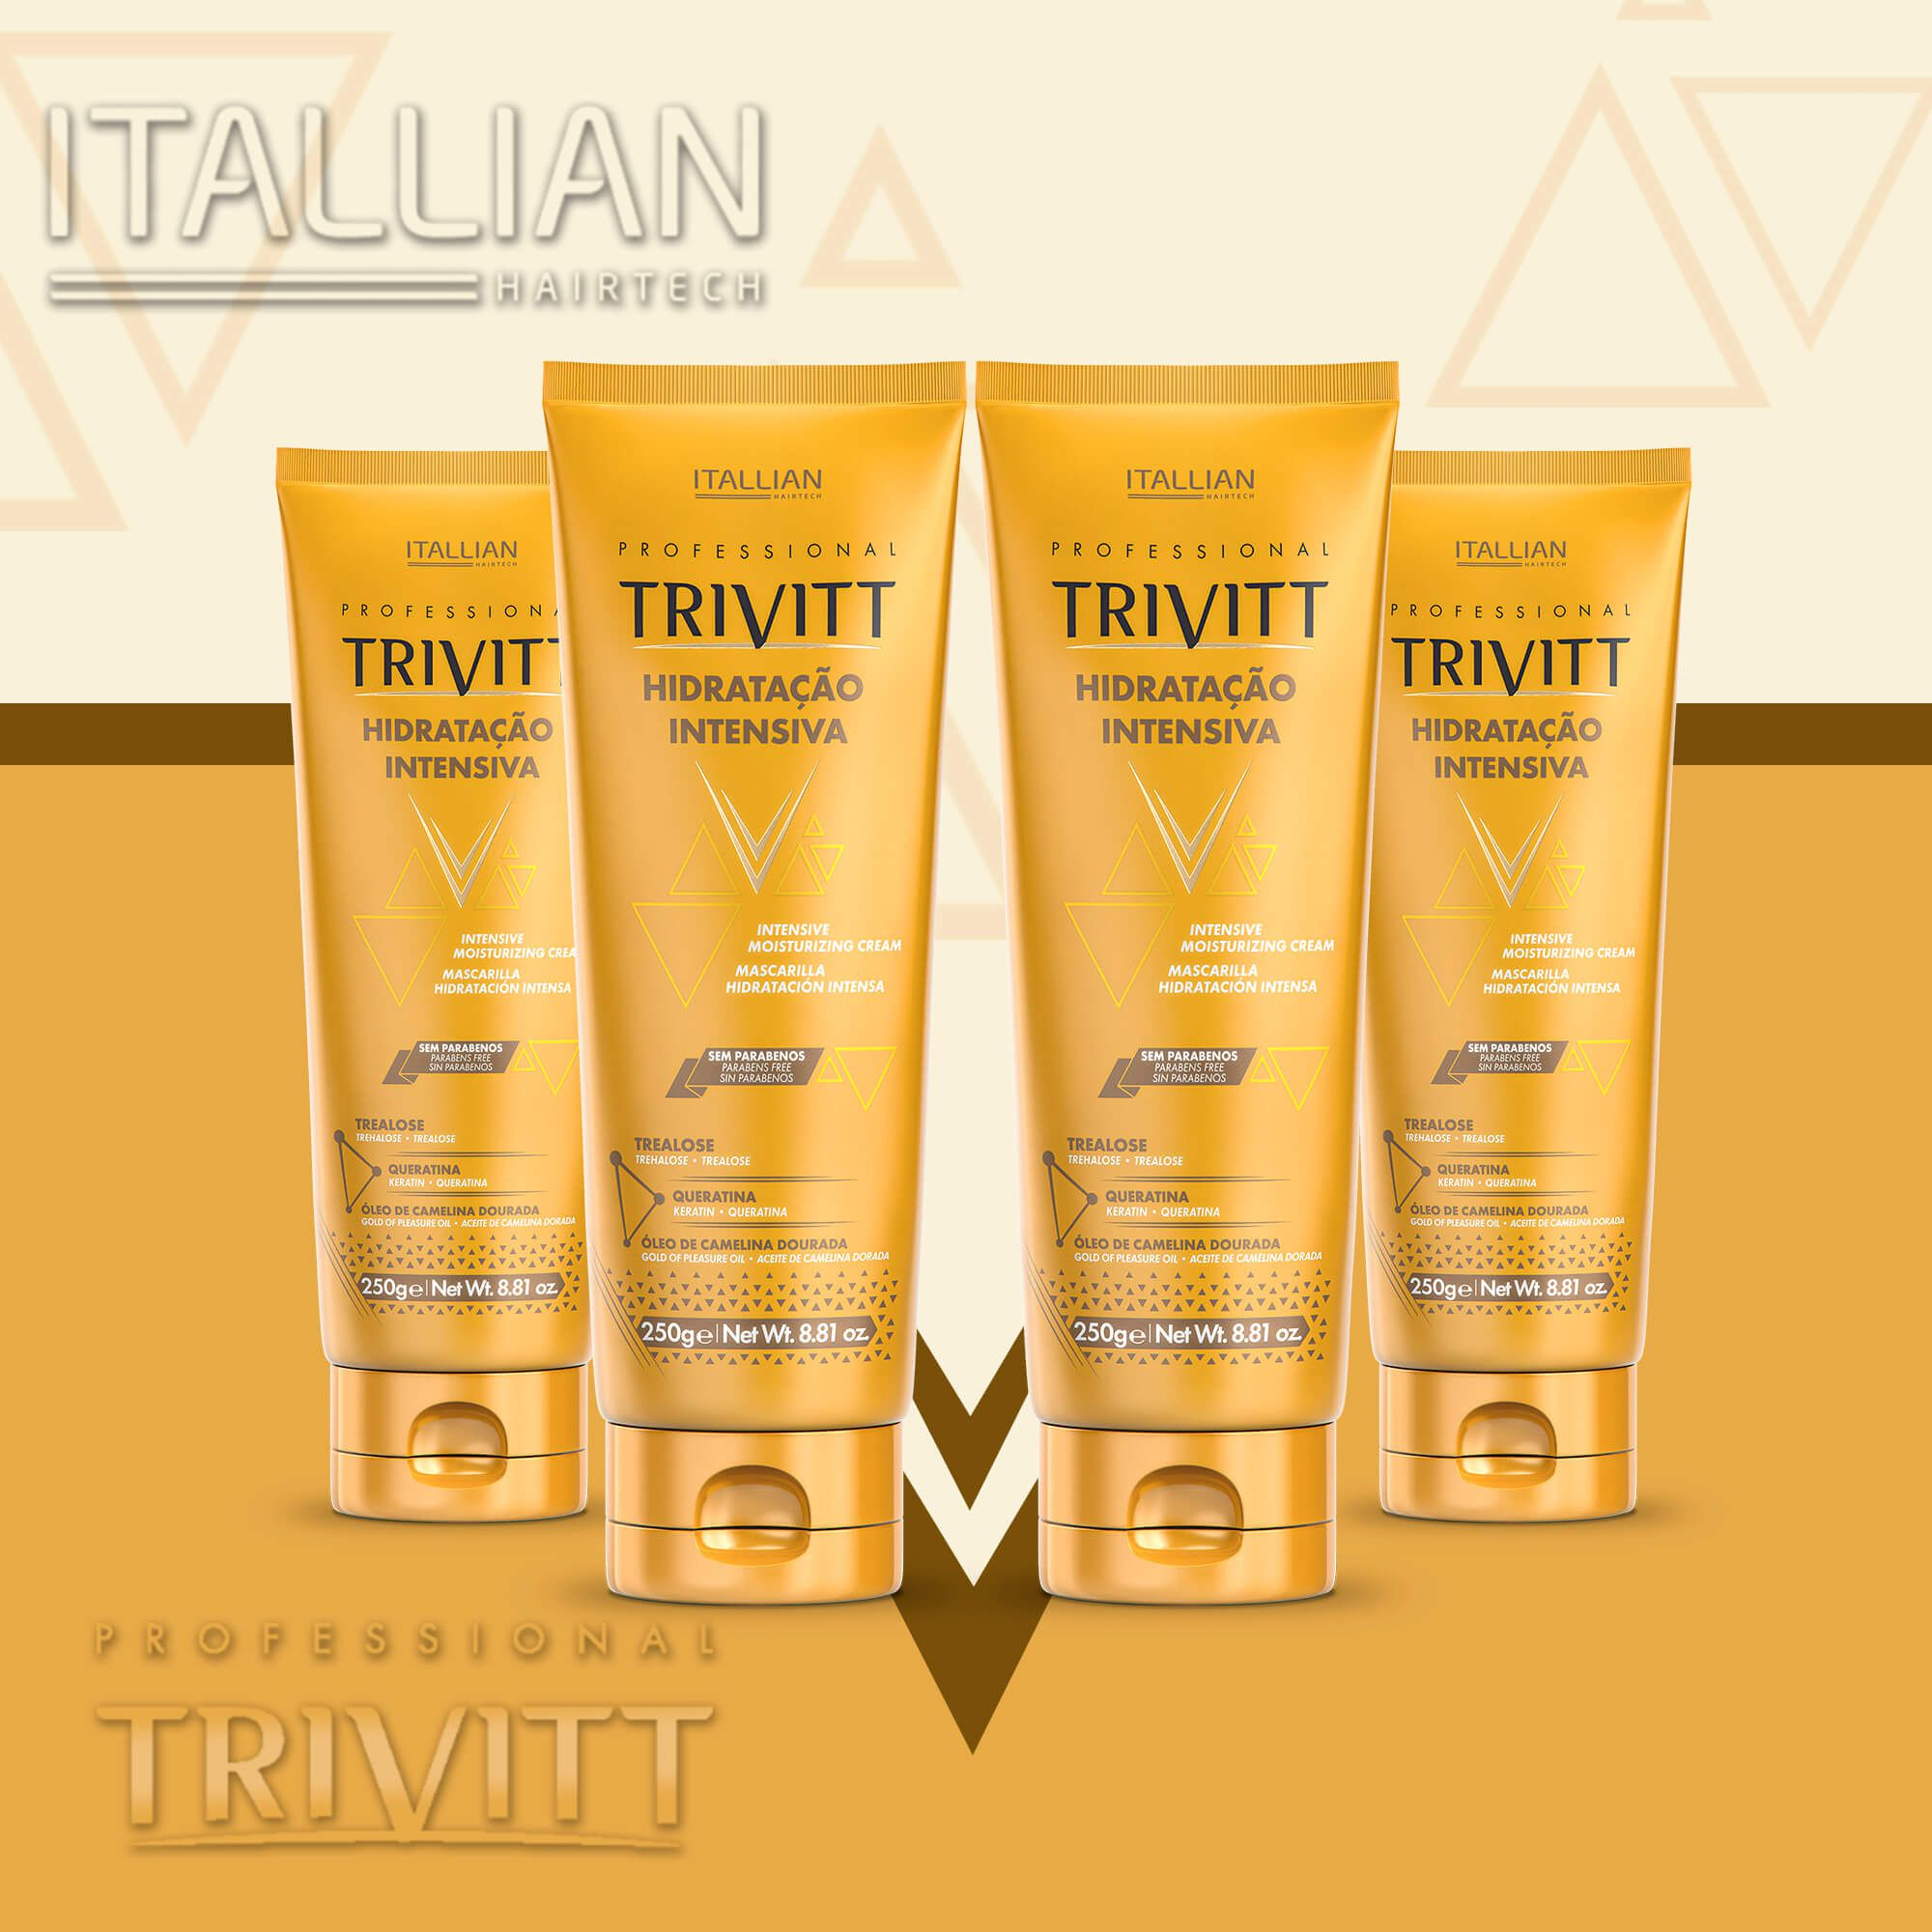 04 Máscaras Hidratação Intensiva Trivitt 250 Gramas + Brinde